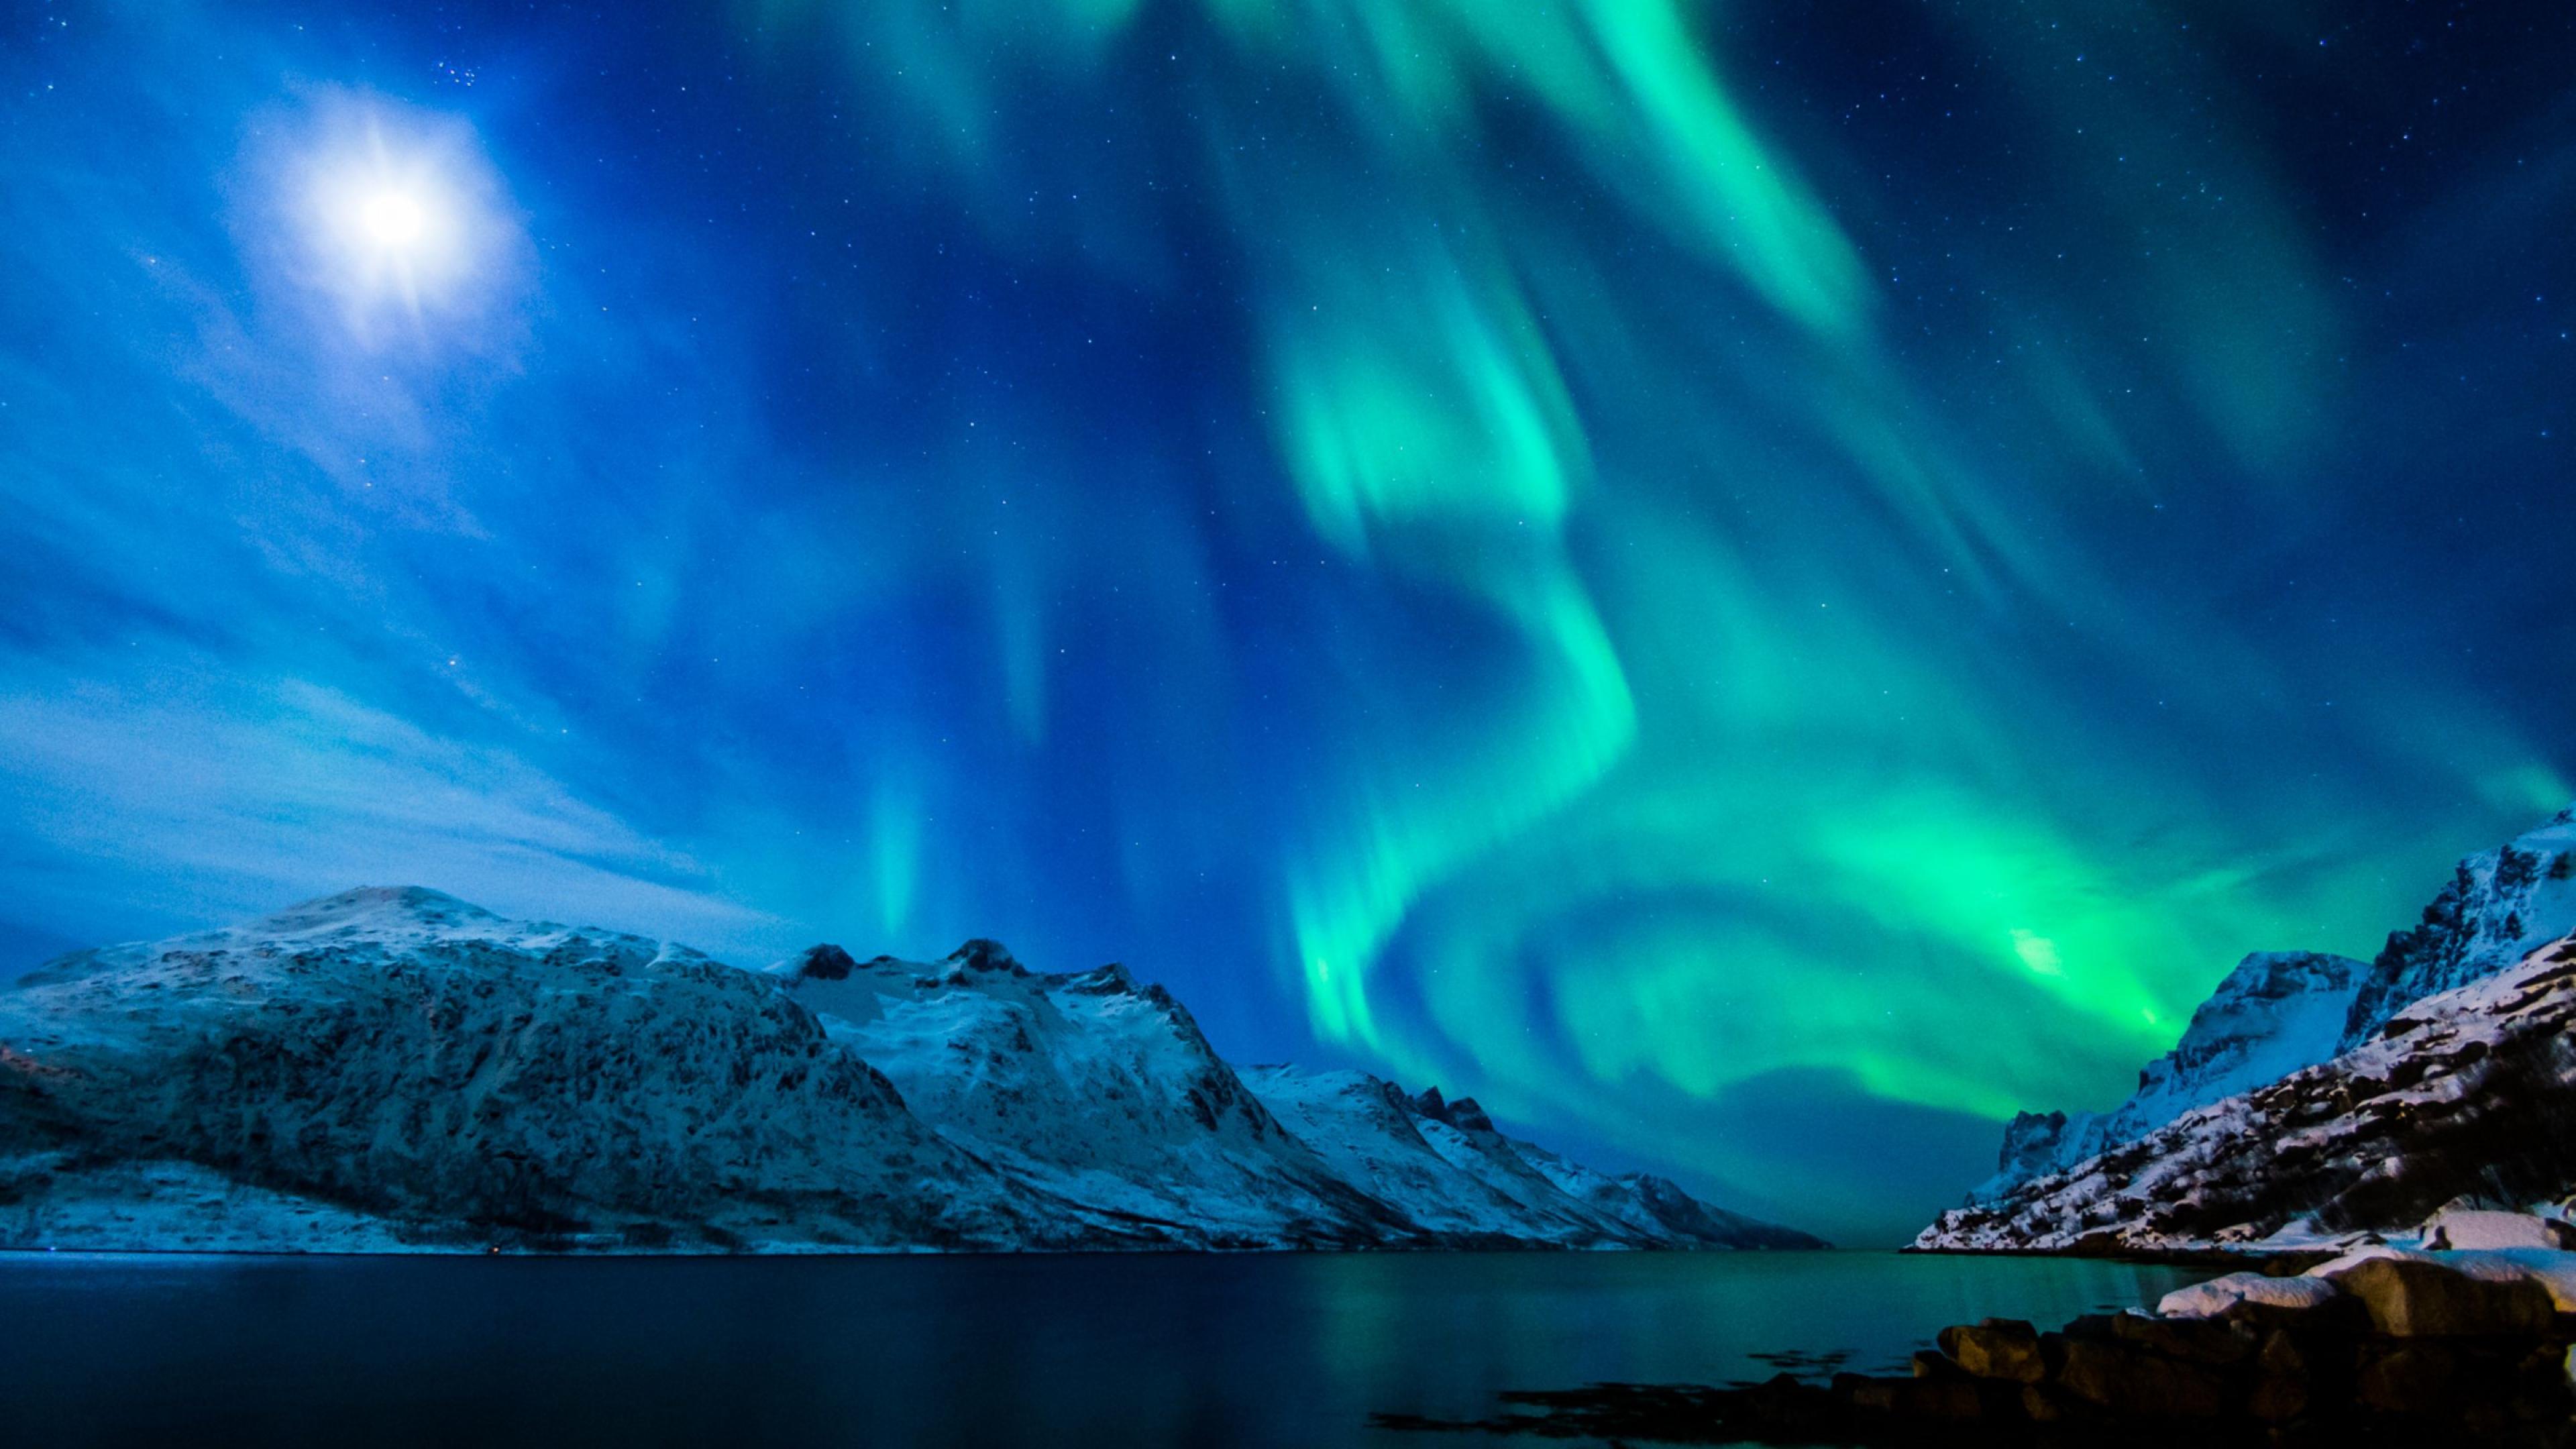 Northern Lights Wallpaper 4k Wallpapersafari